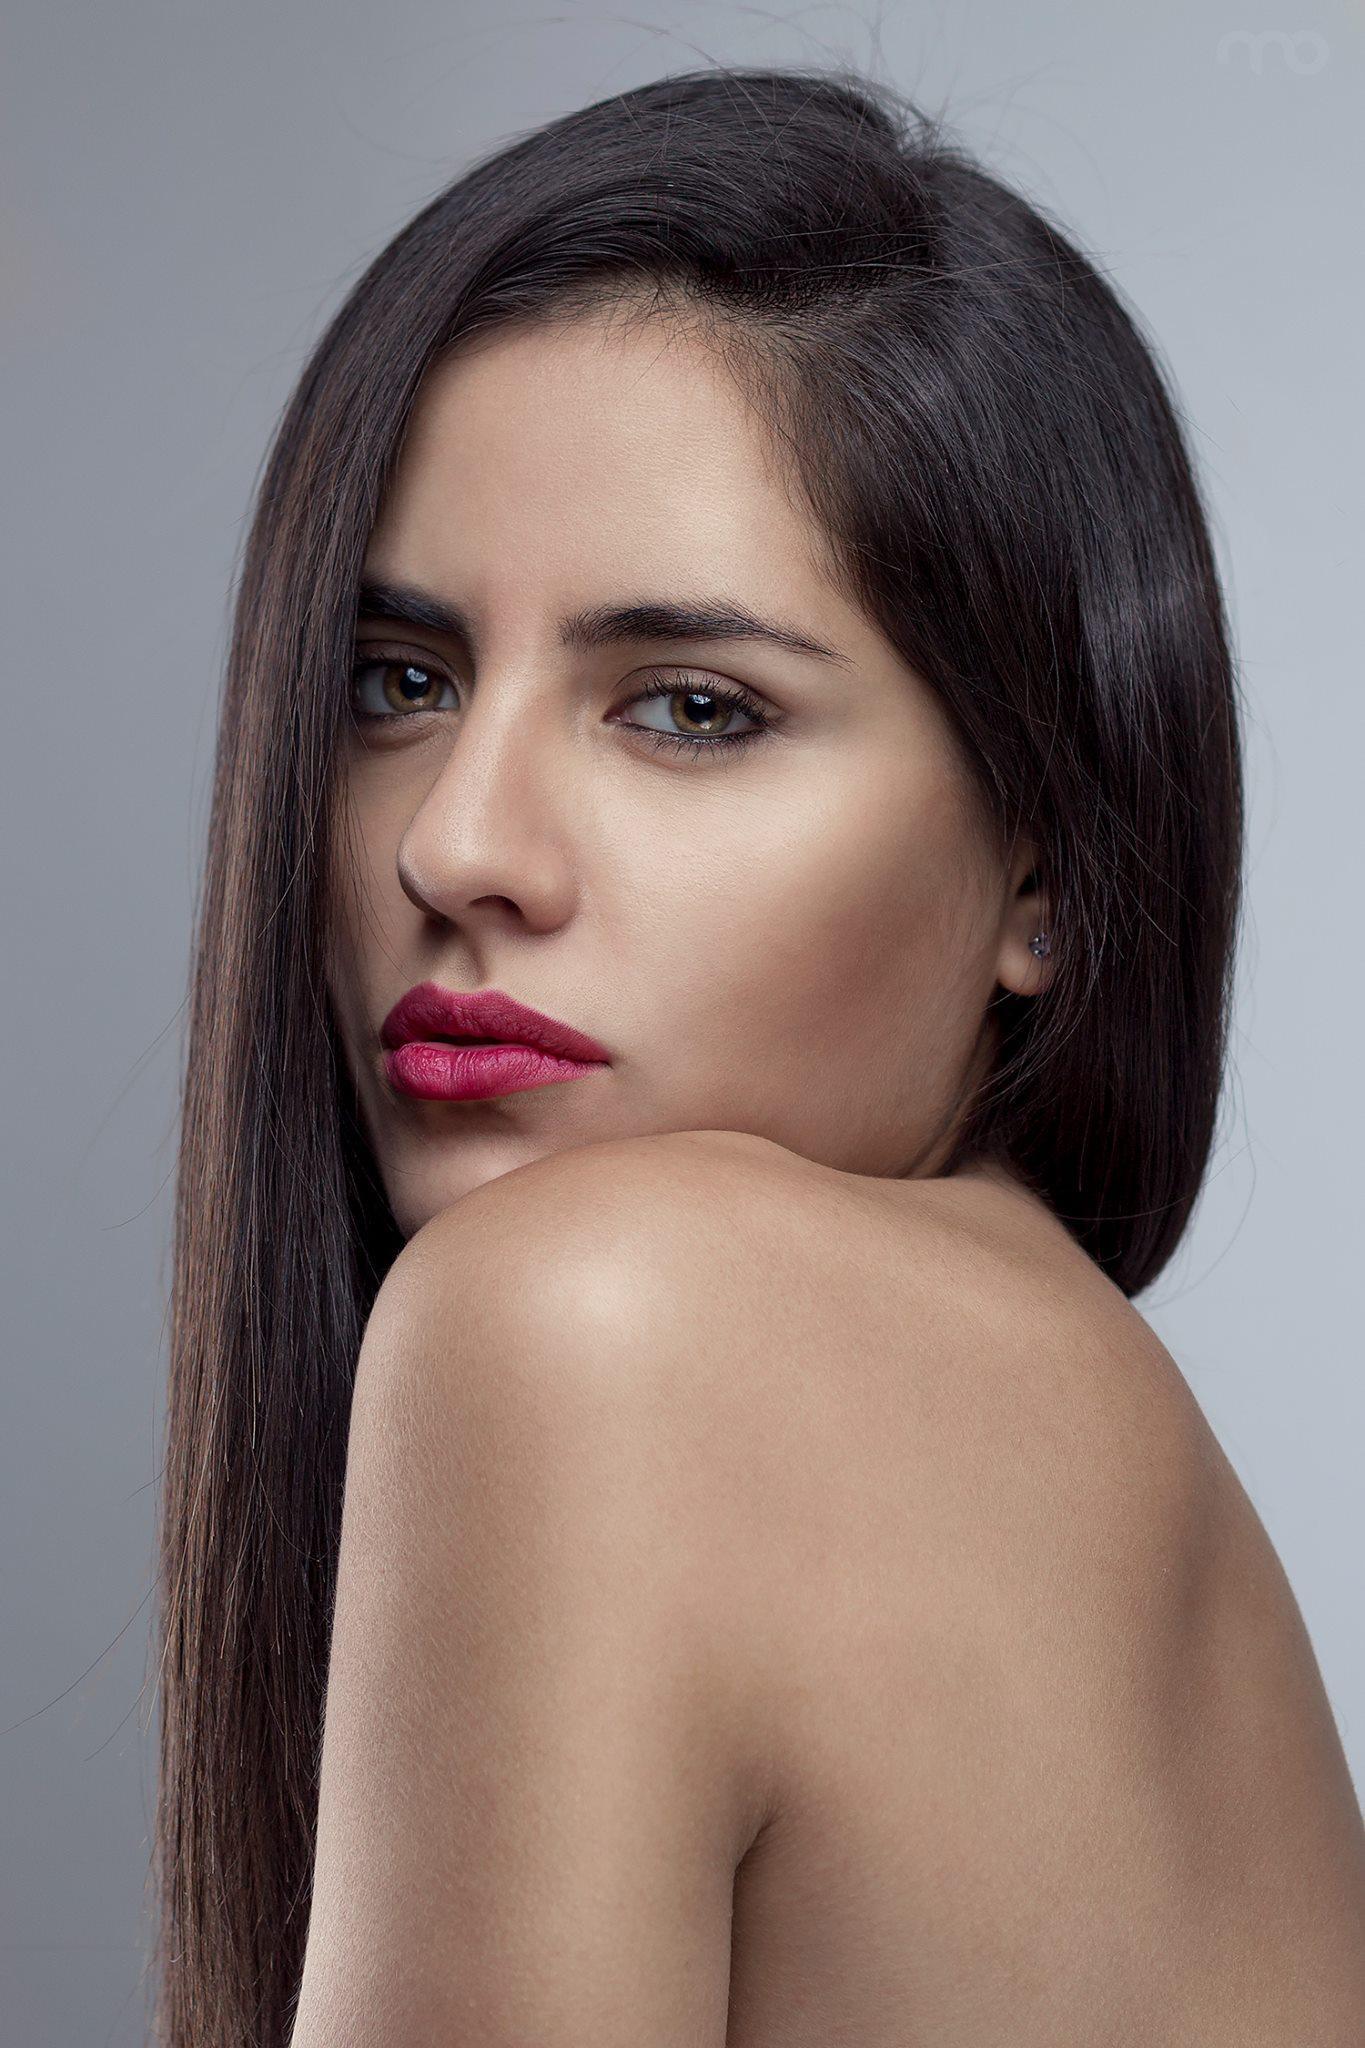 Shine-Female-Model-Fashion-Beauty-Violeta-06.jpg#asset:45018